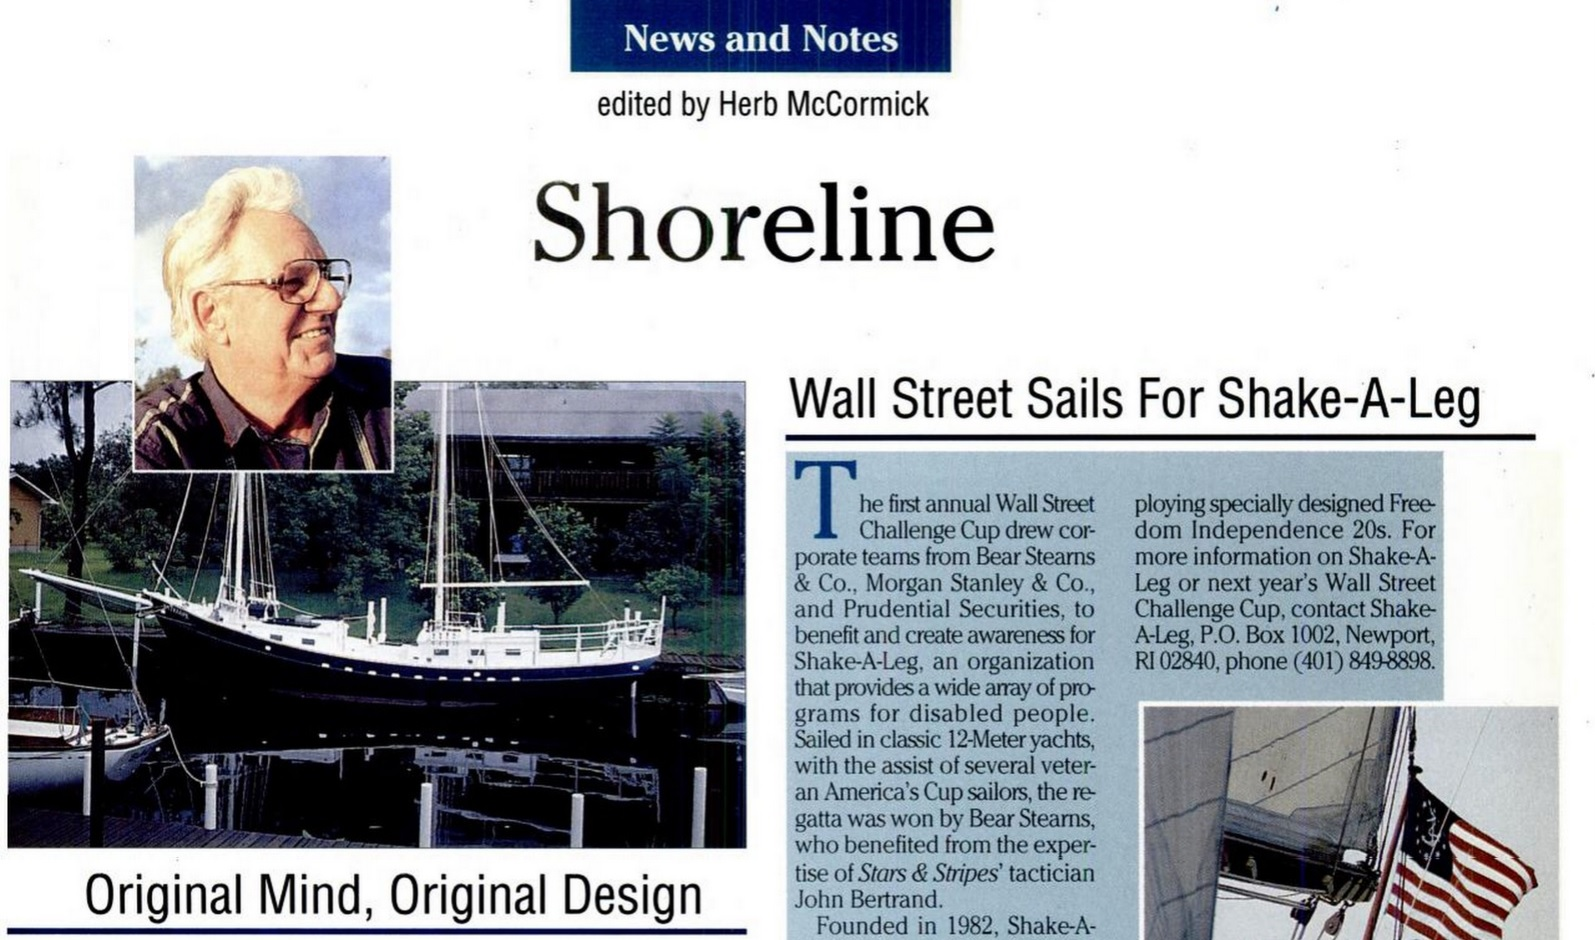 Tom Colvin 37ft Cargo Schooner Antelope Cruising World Oct. 1992 page 13 top.jpg